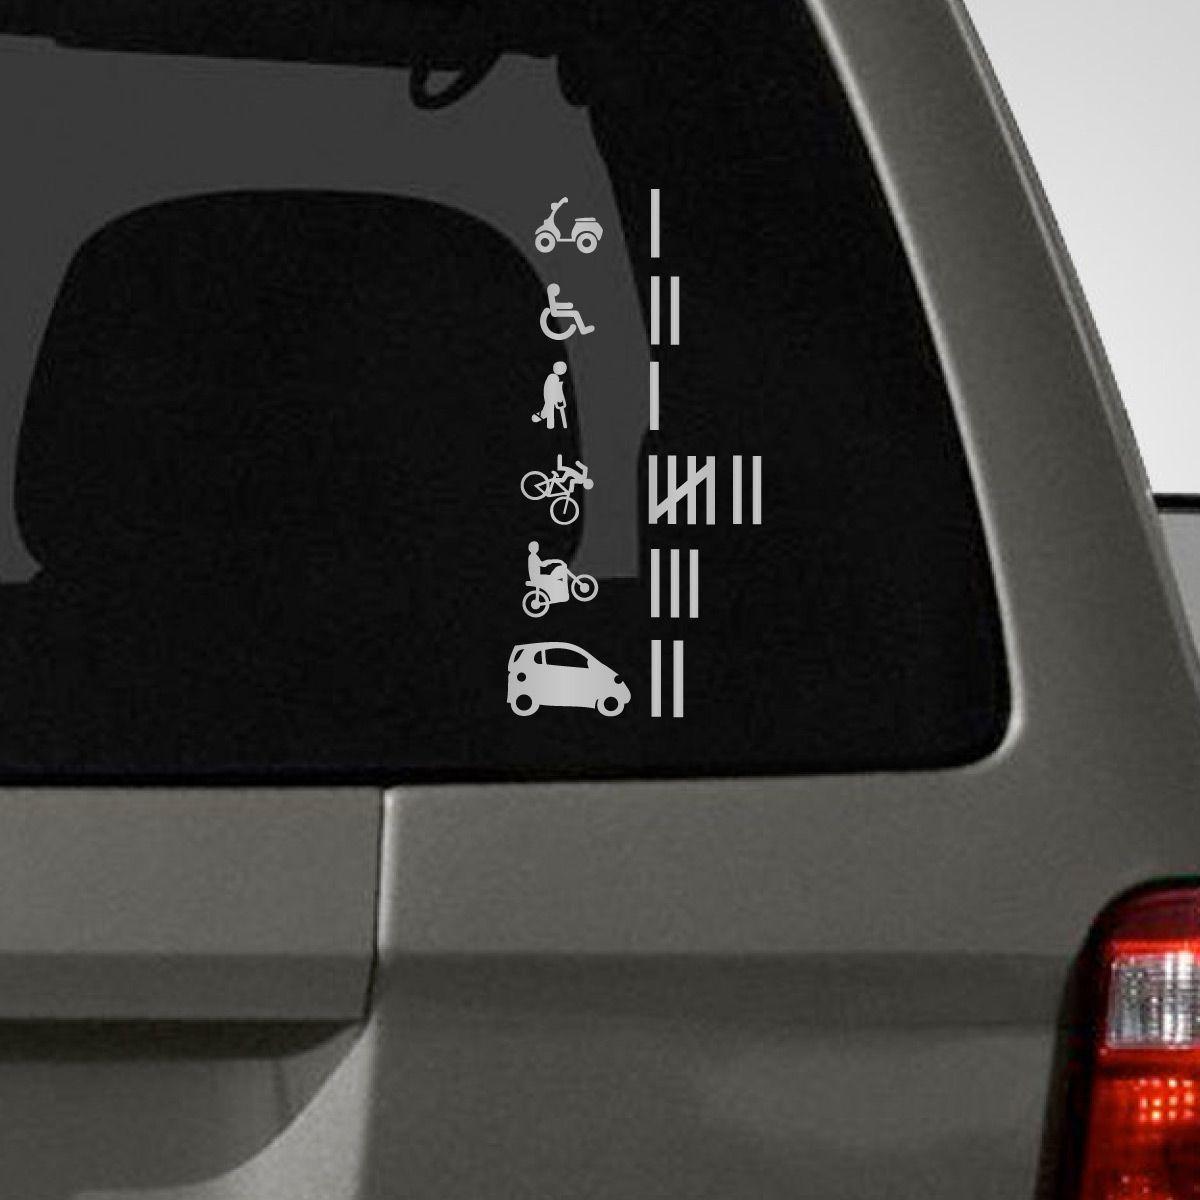 Keeping Score Car Decal Car Decals Car Stick Figure Family [ 1200 x 1200 Pixel ]